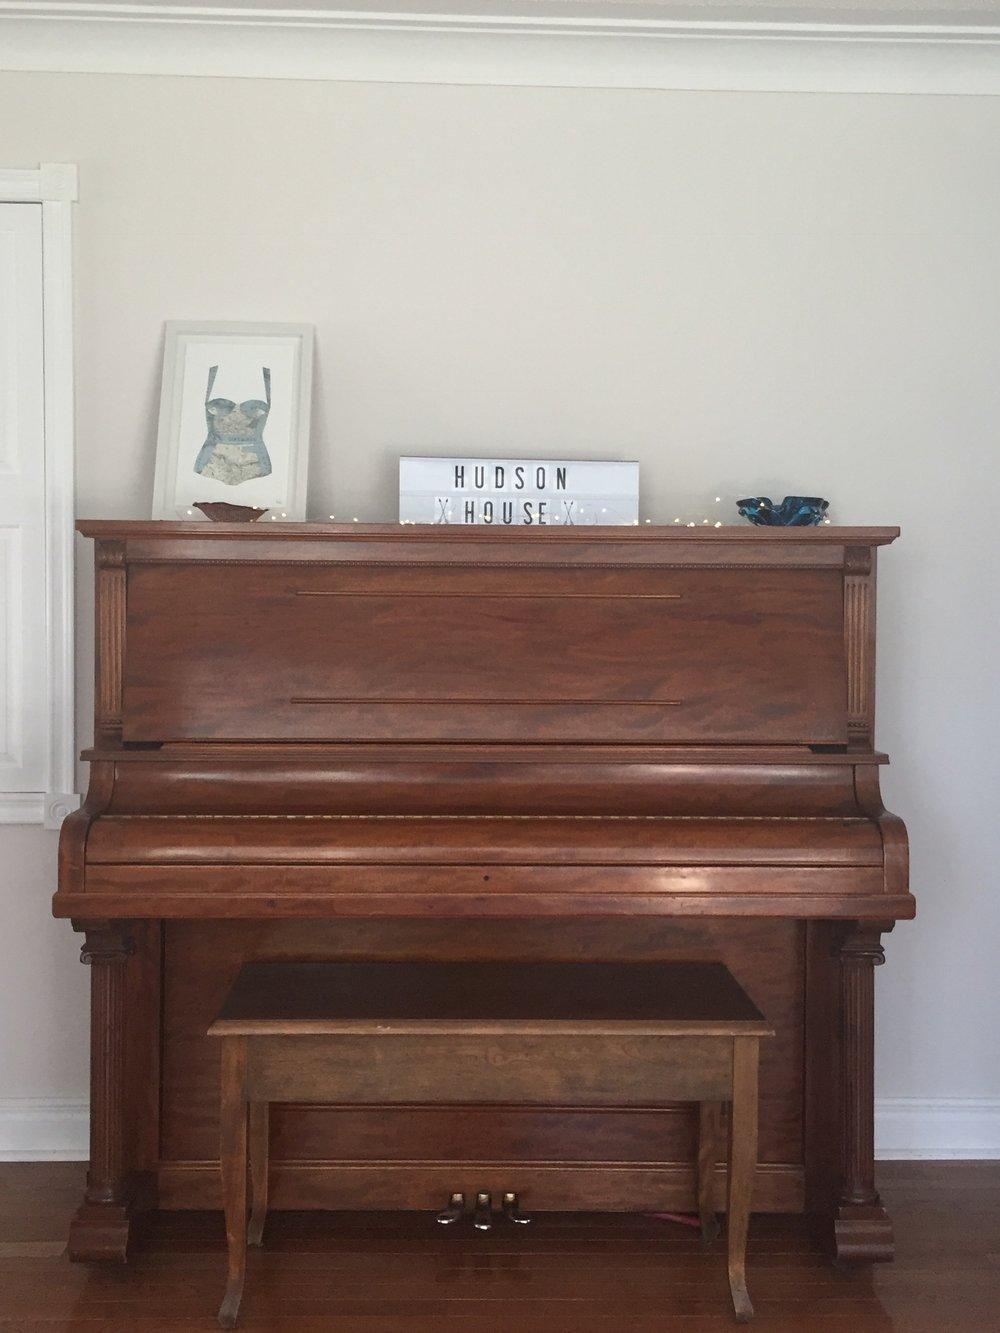 Hudson House Piano